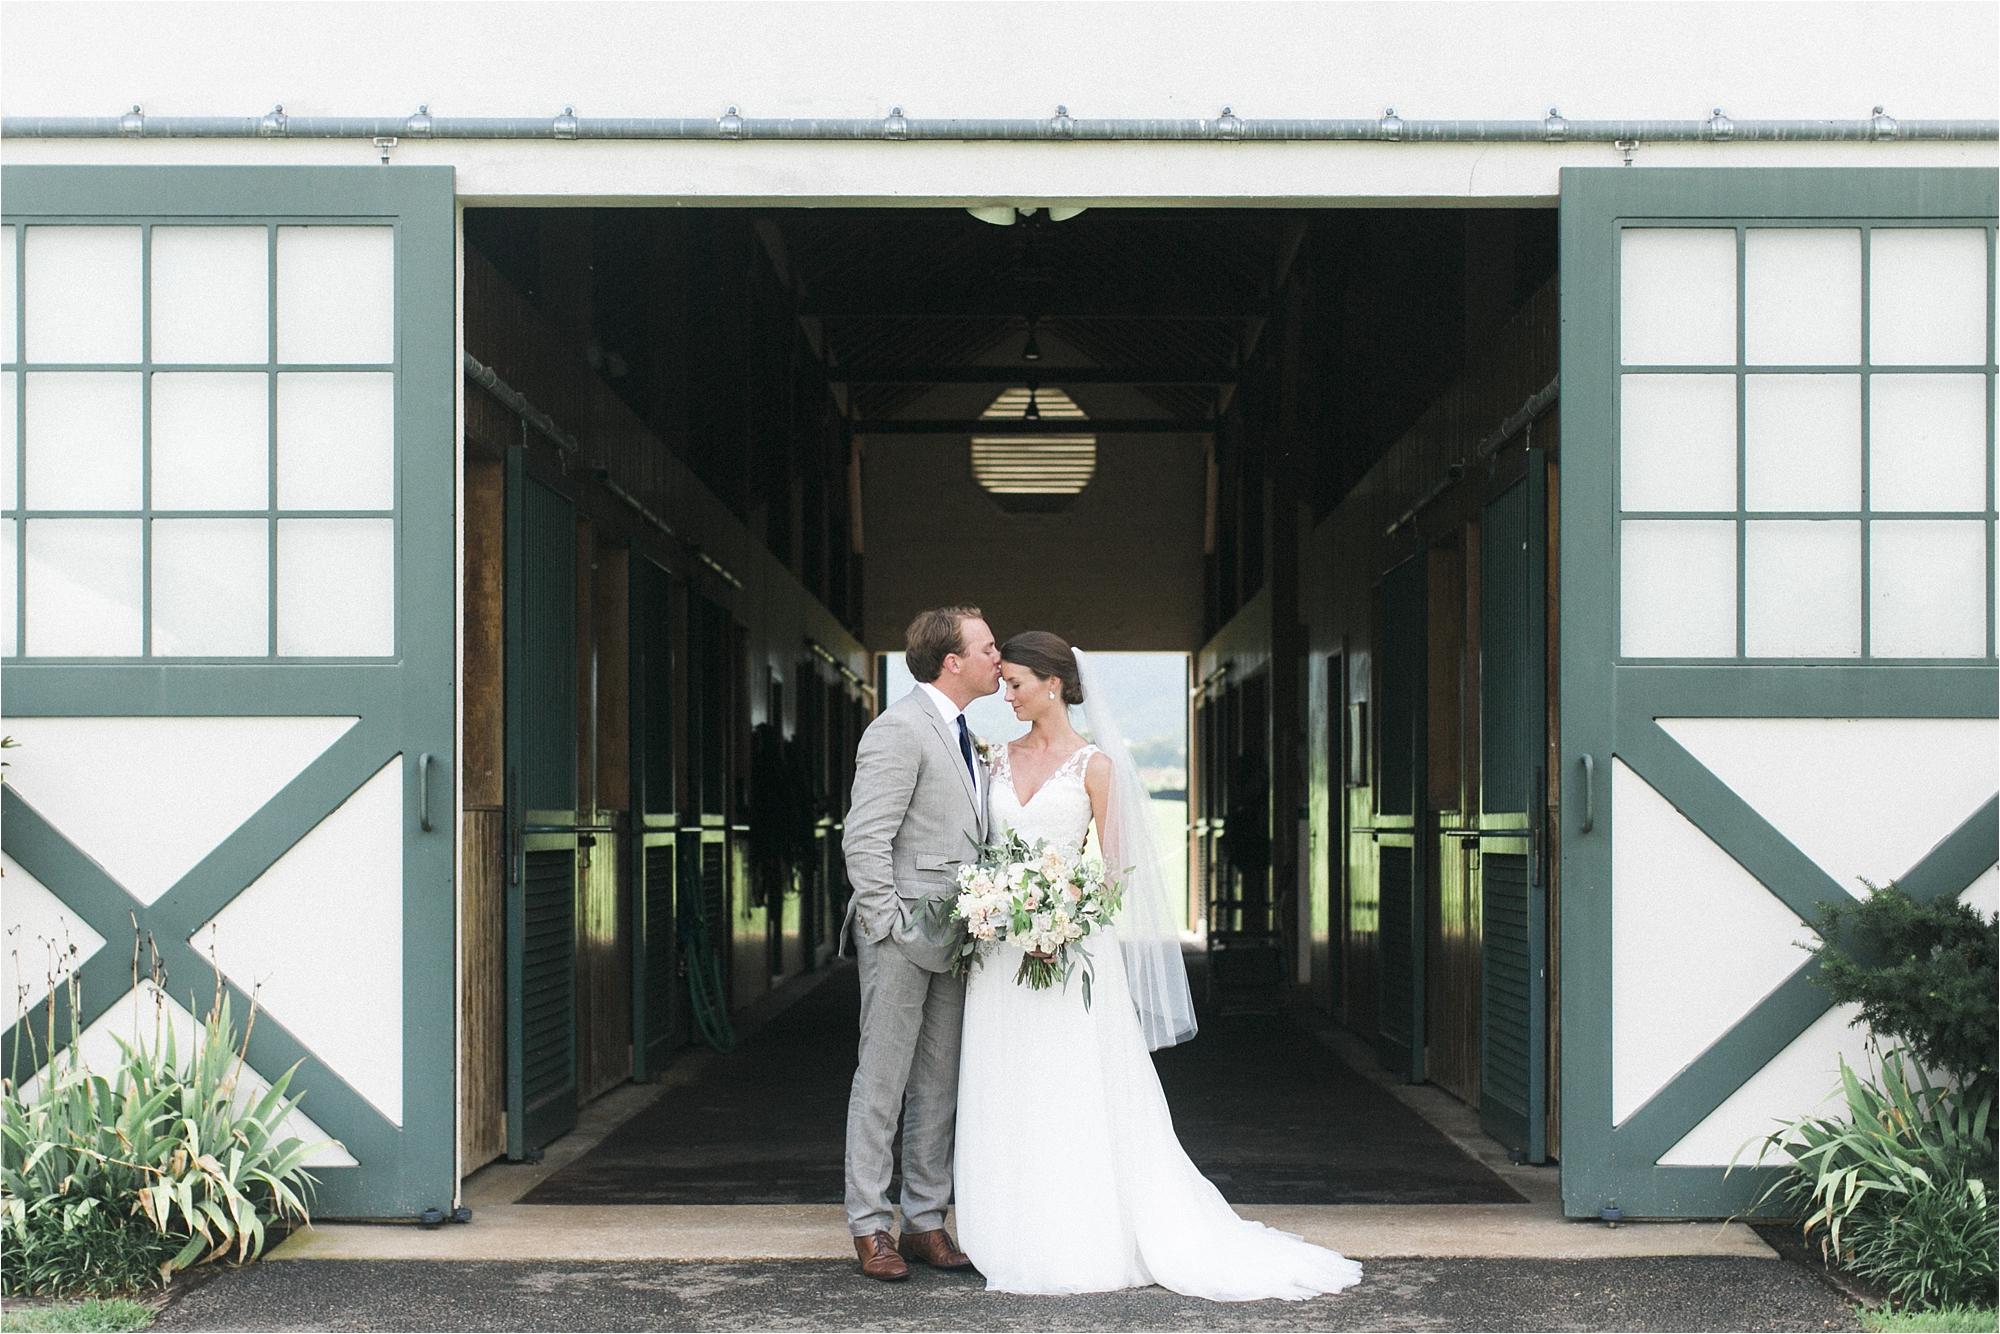 stephanie-yonce-charlottesville-virginia-king-family-vineyard-wedding-photos_0013.jpg